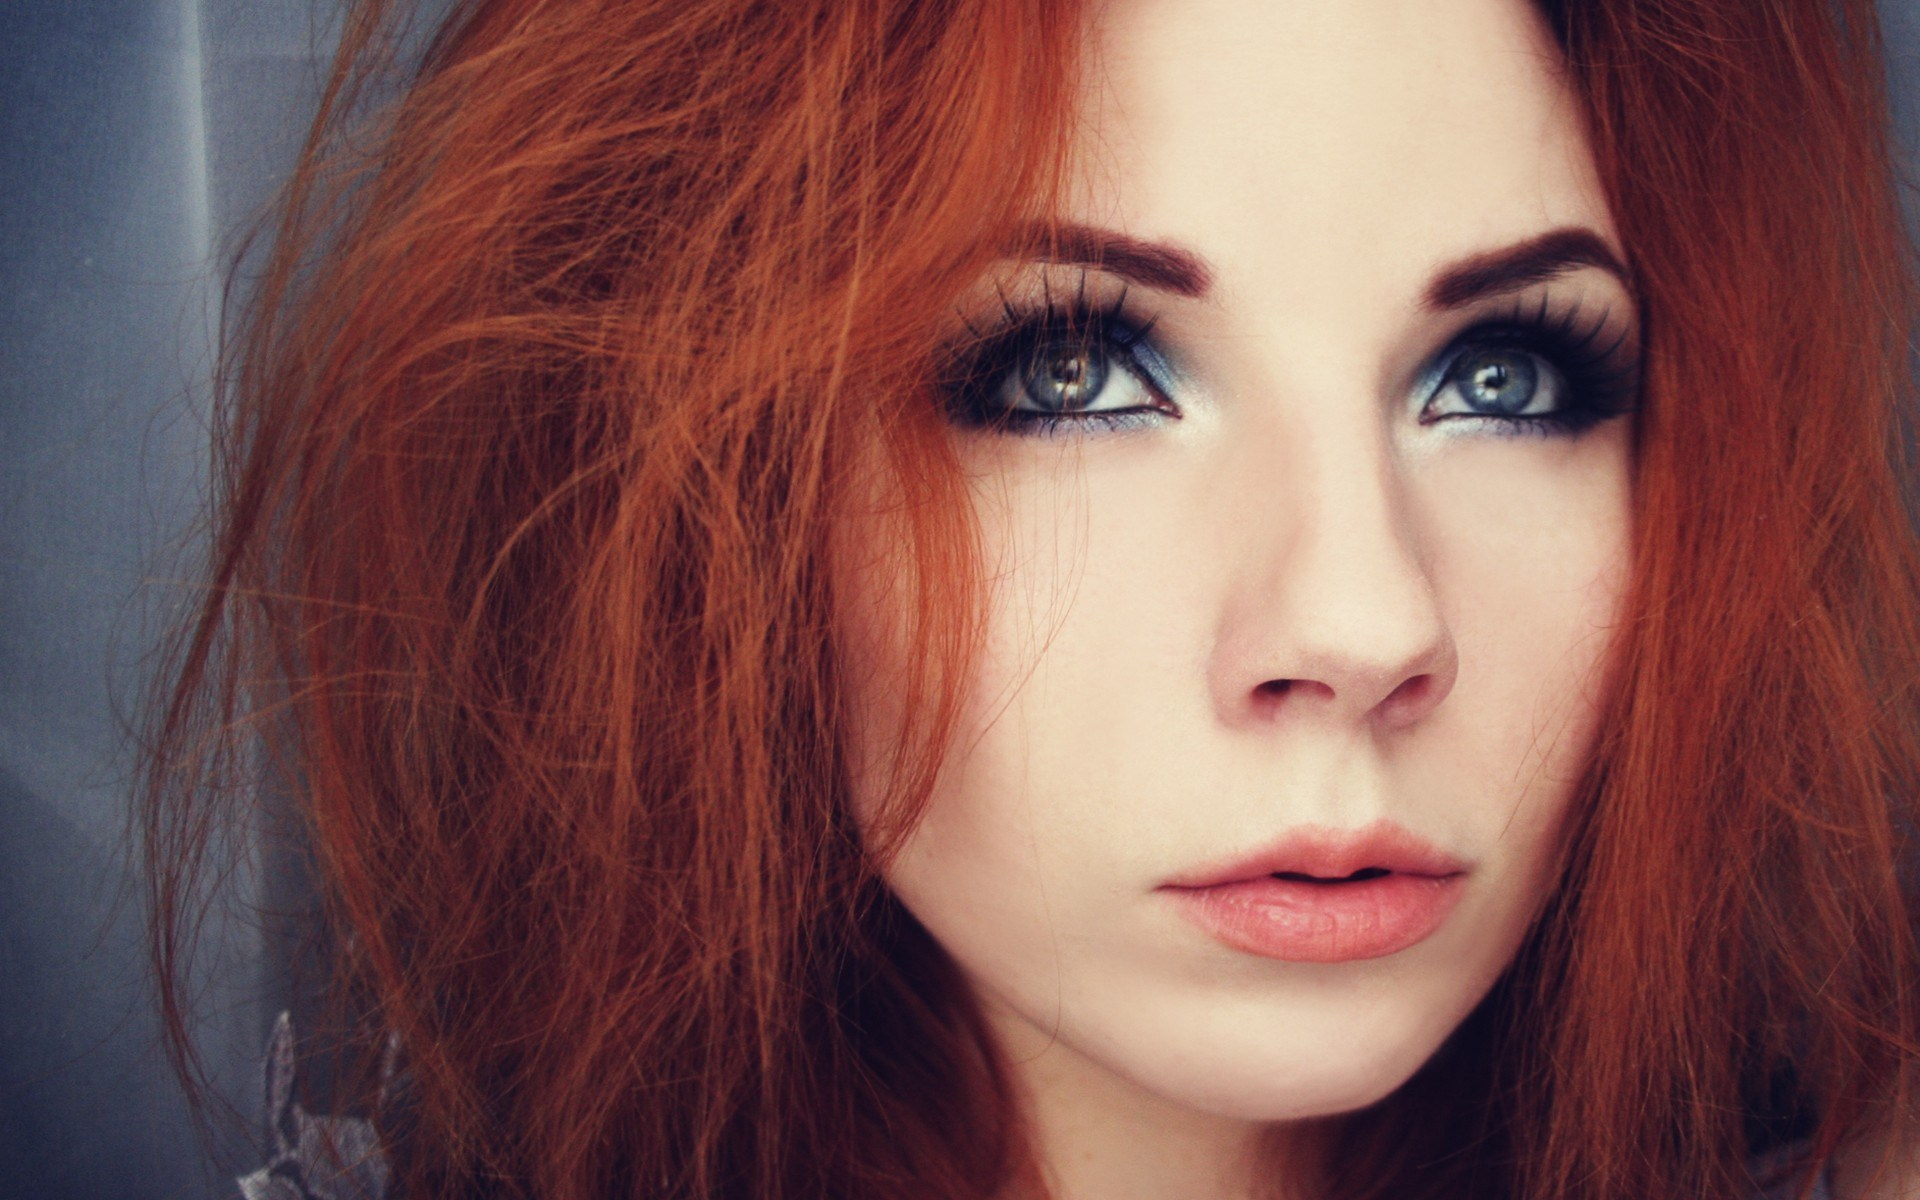 Portrait Redhead Girl Look